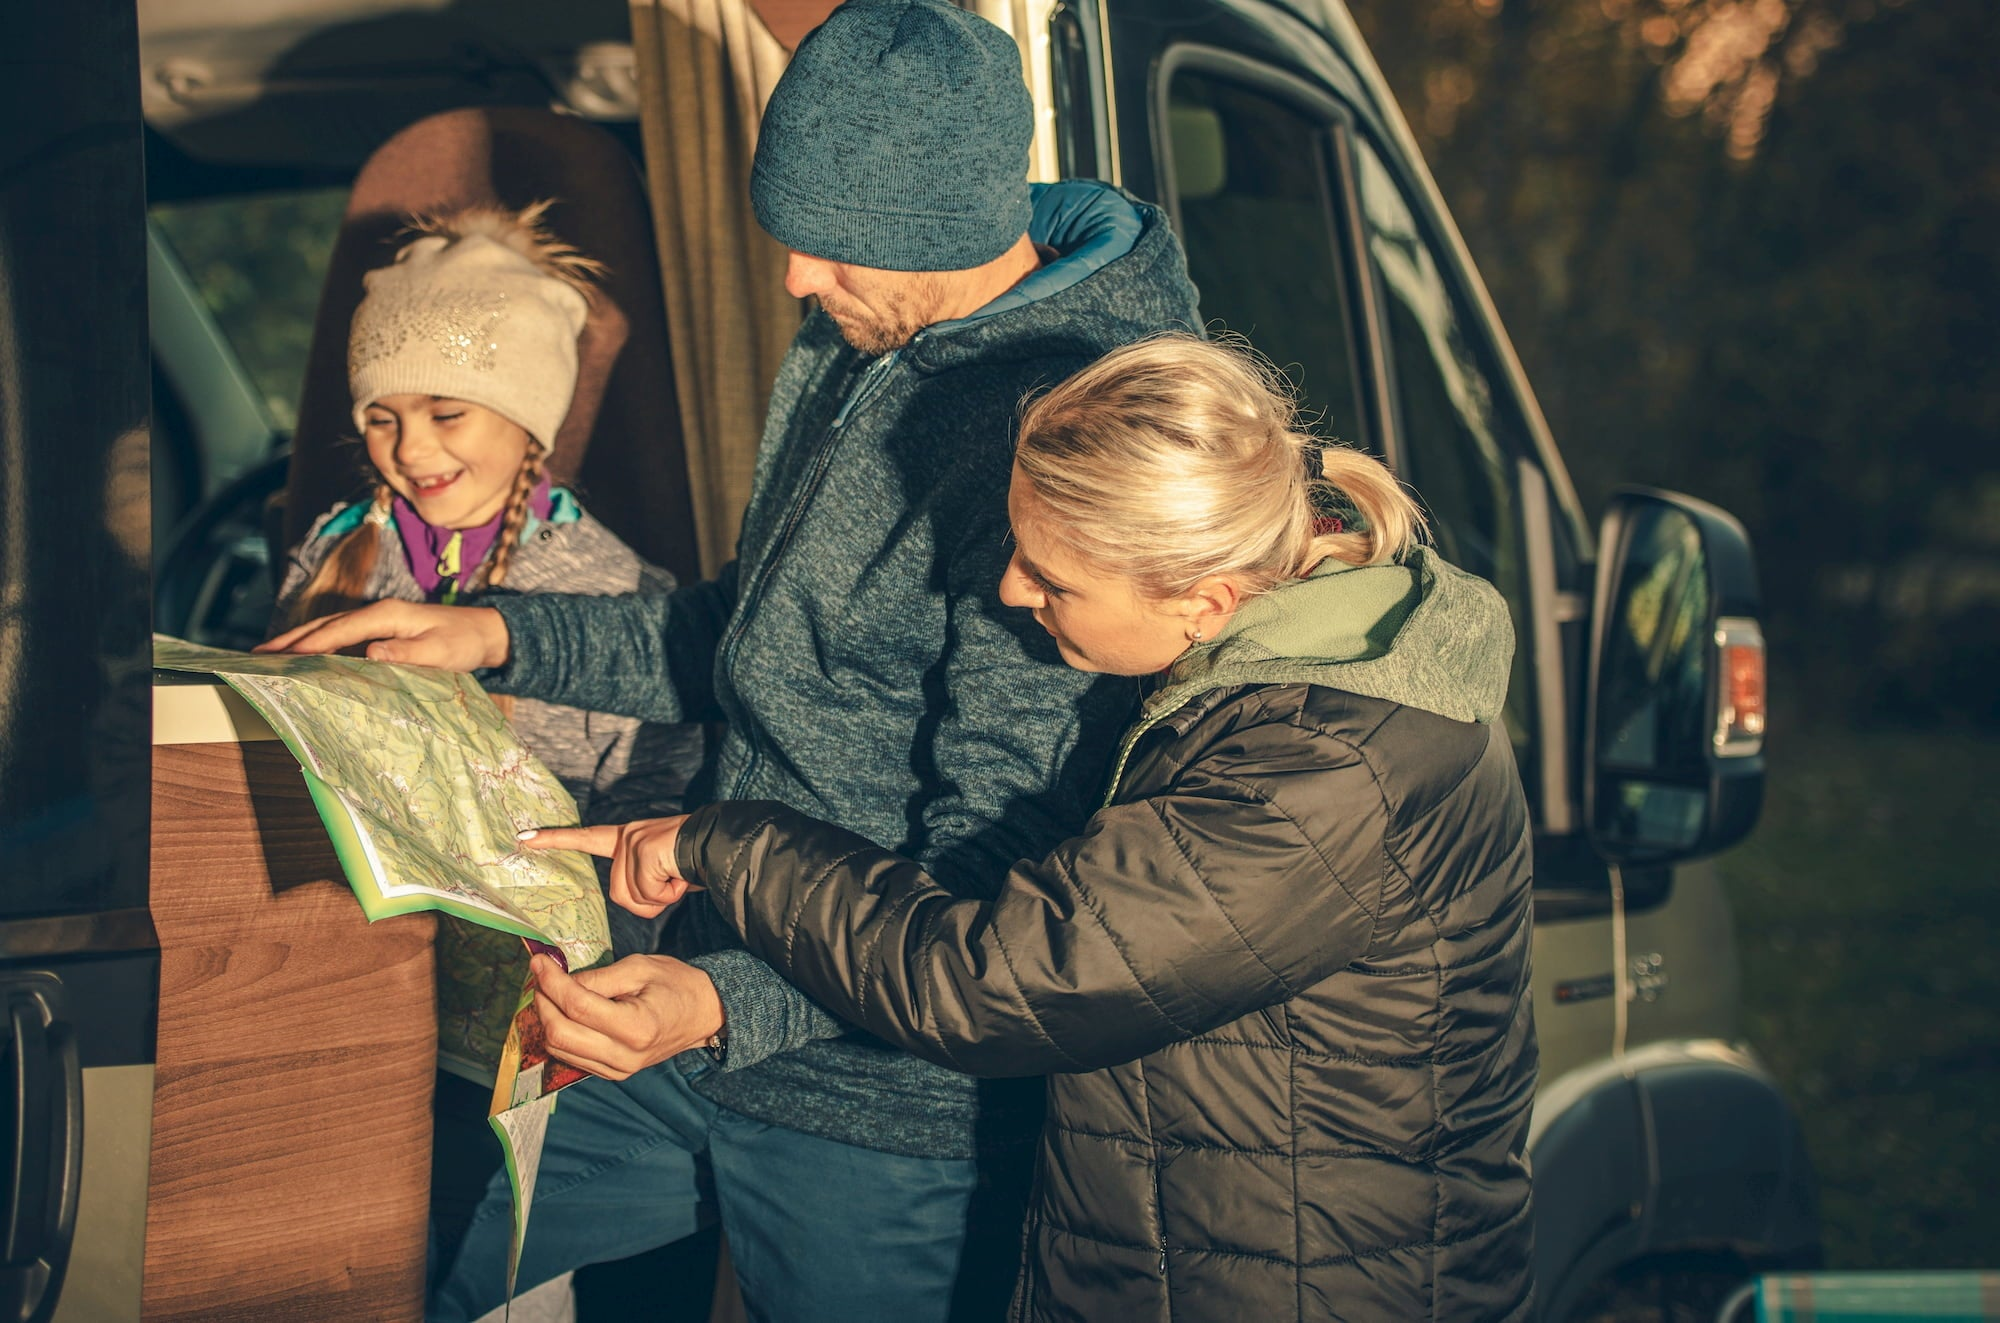 Family planning trip via a map in RV/sprinter van.